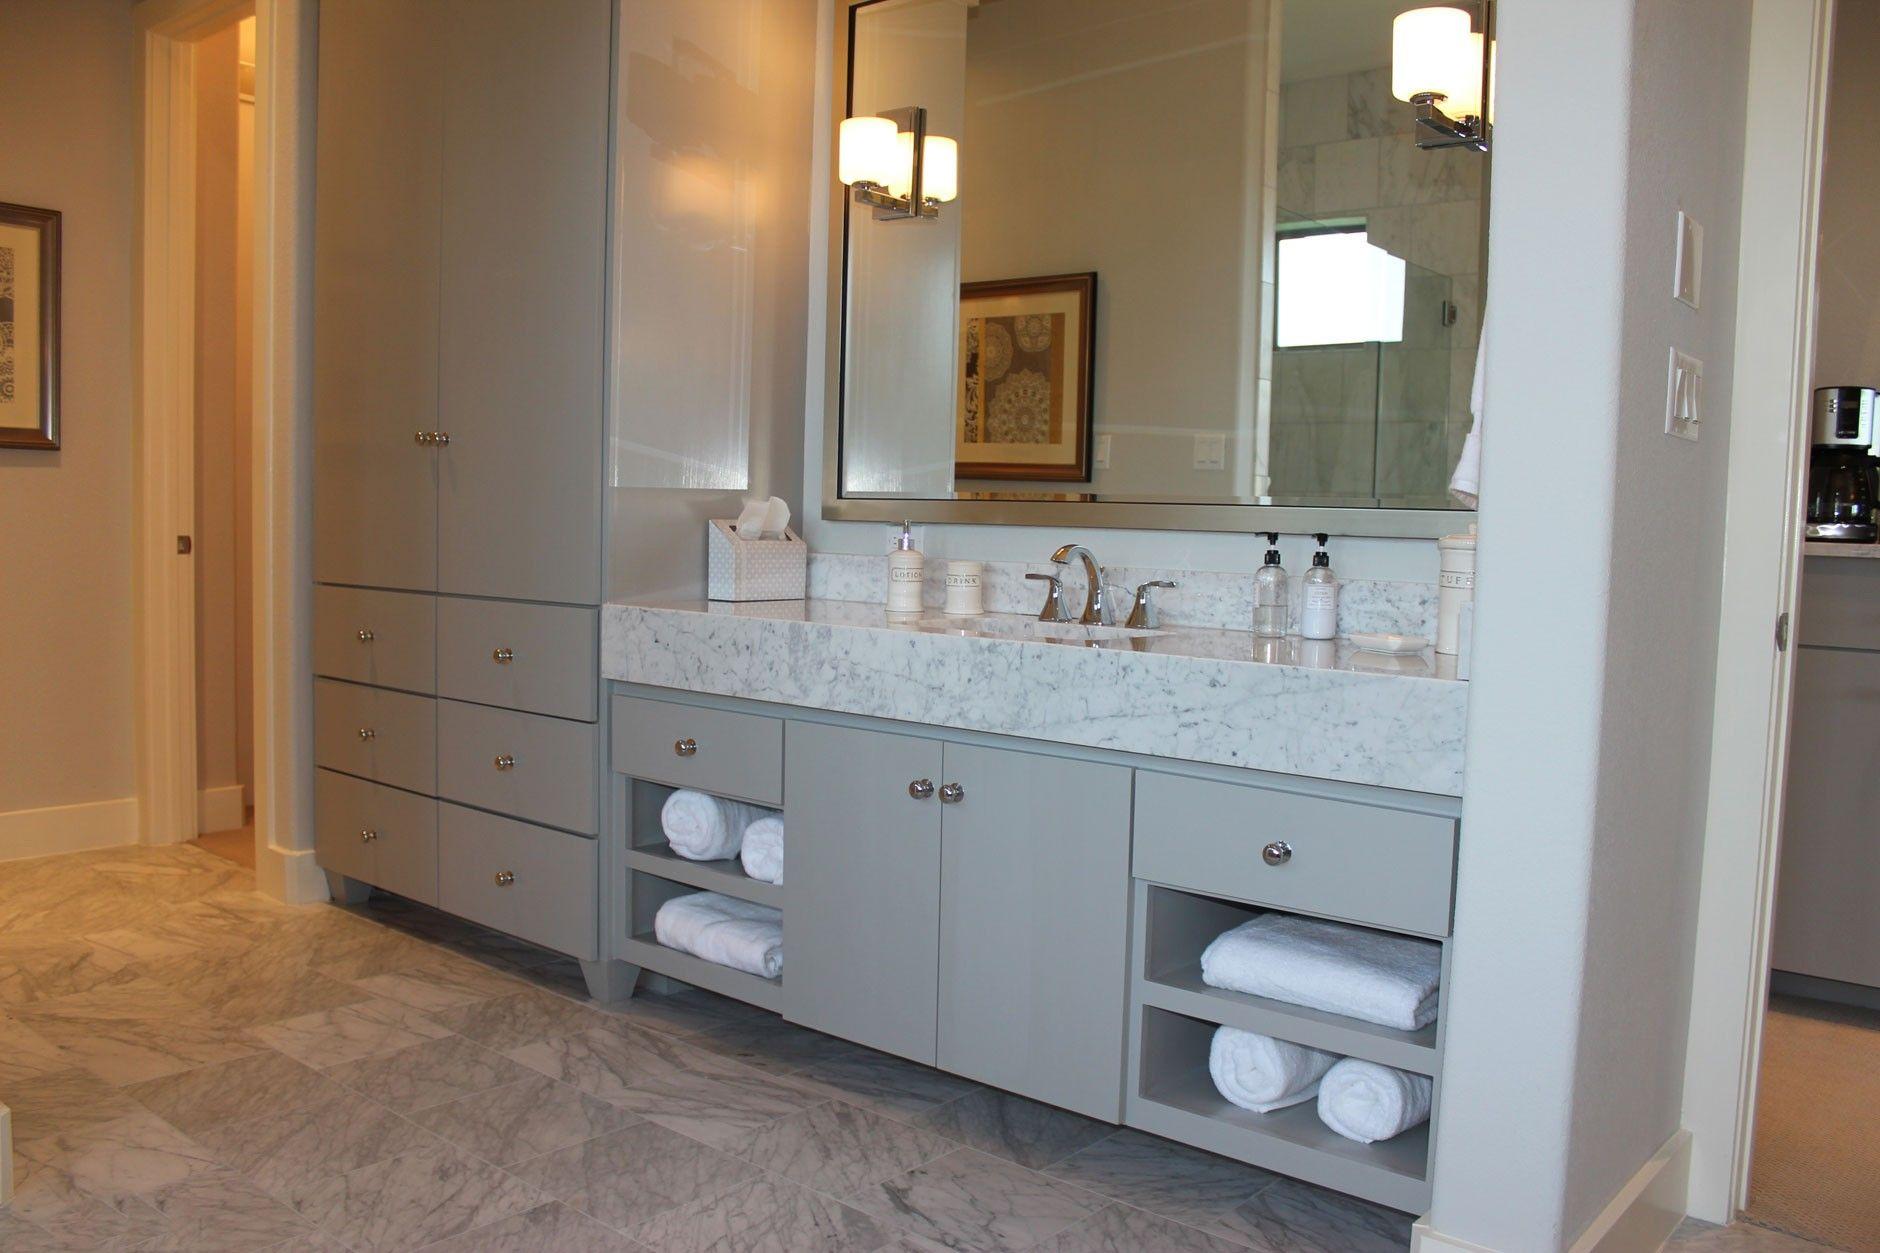 Badezimmer eitelkeiten vermont pin by megan dorton on new house in   pinterest  new homes and